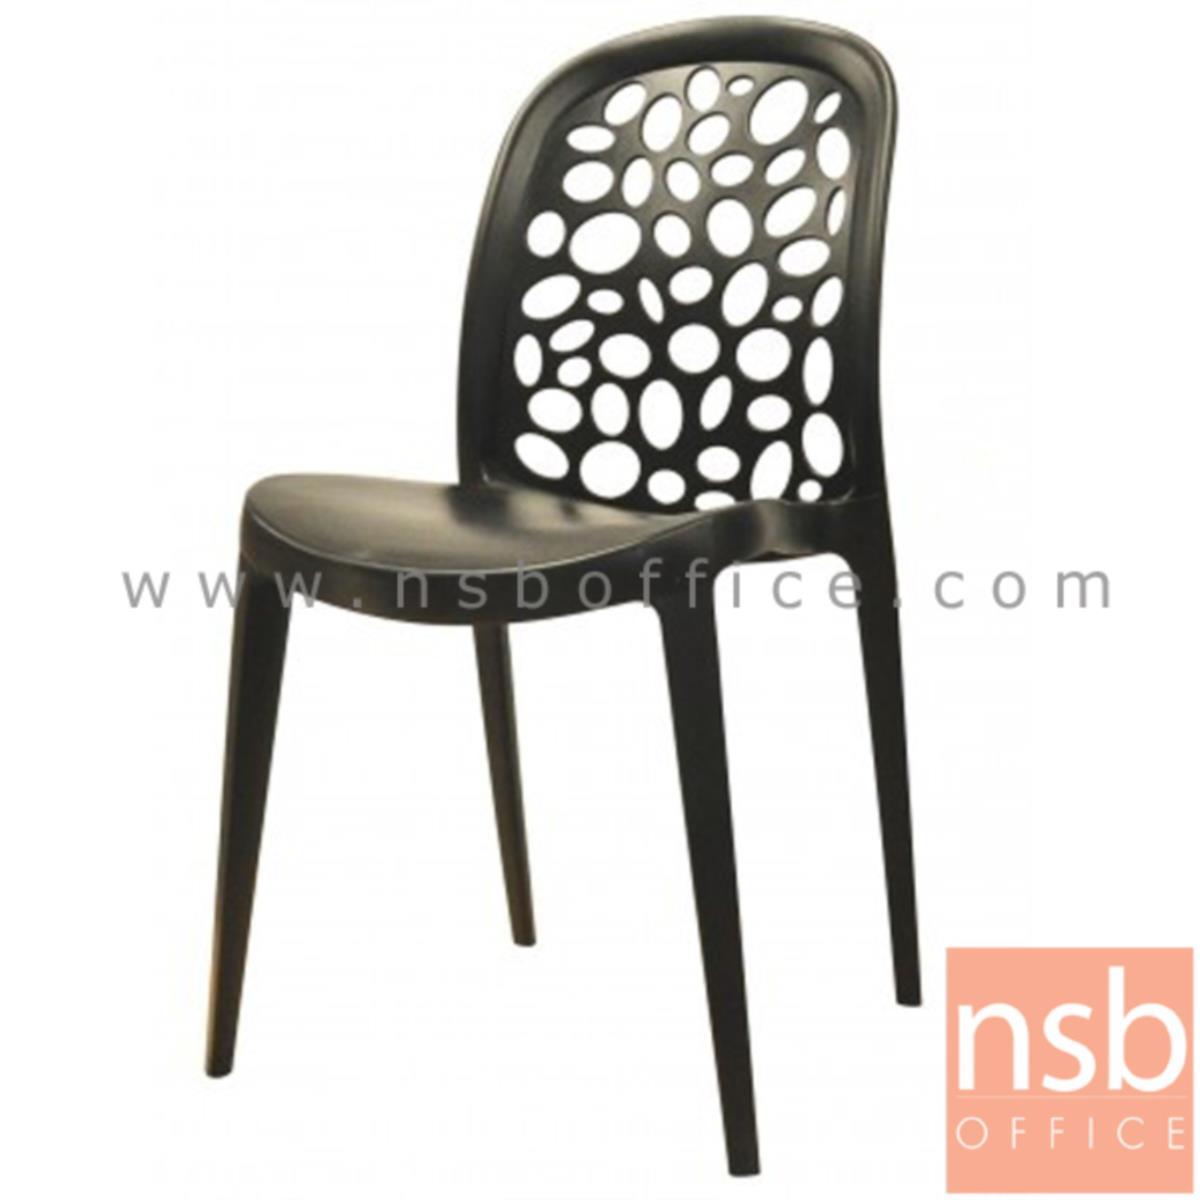 B29A221:เก้าอี้โมเดิร์นพลาสติกโพลี่ล้วน รุ่น Carney (คาร์นีย์) ขนาด 64W cm.